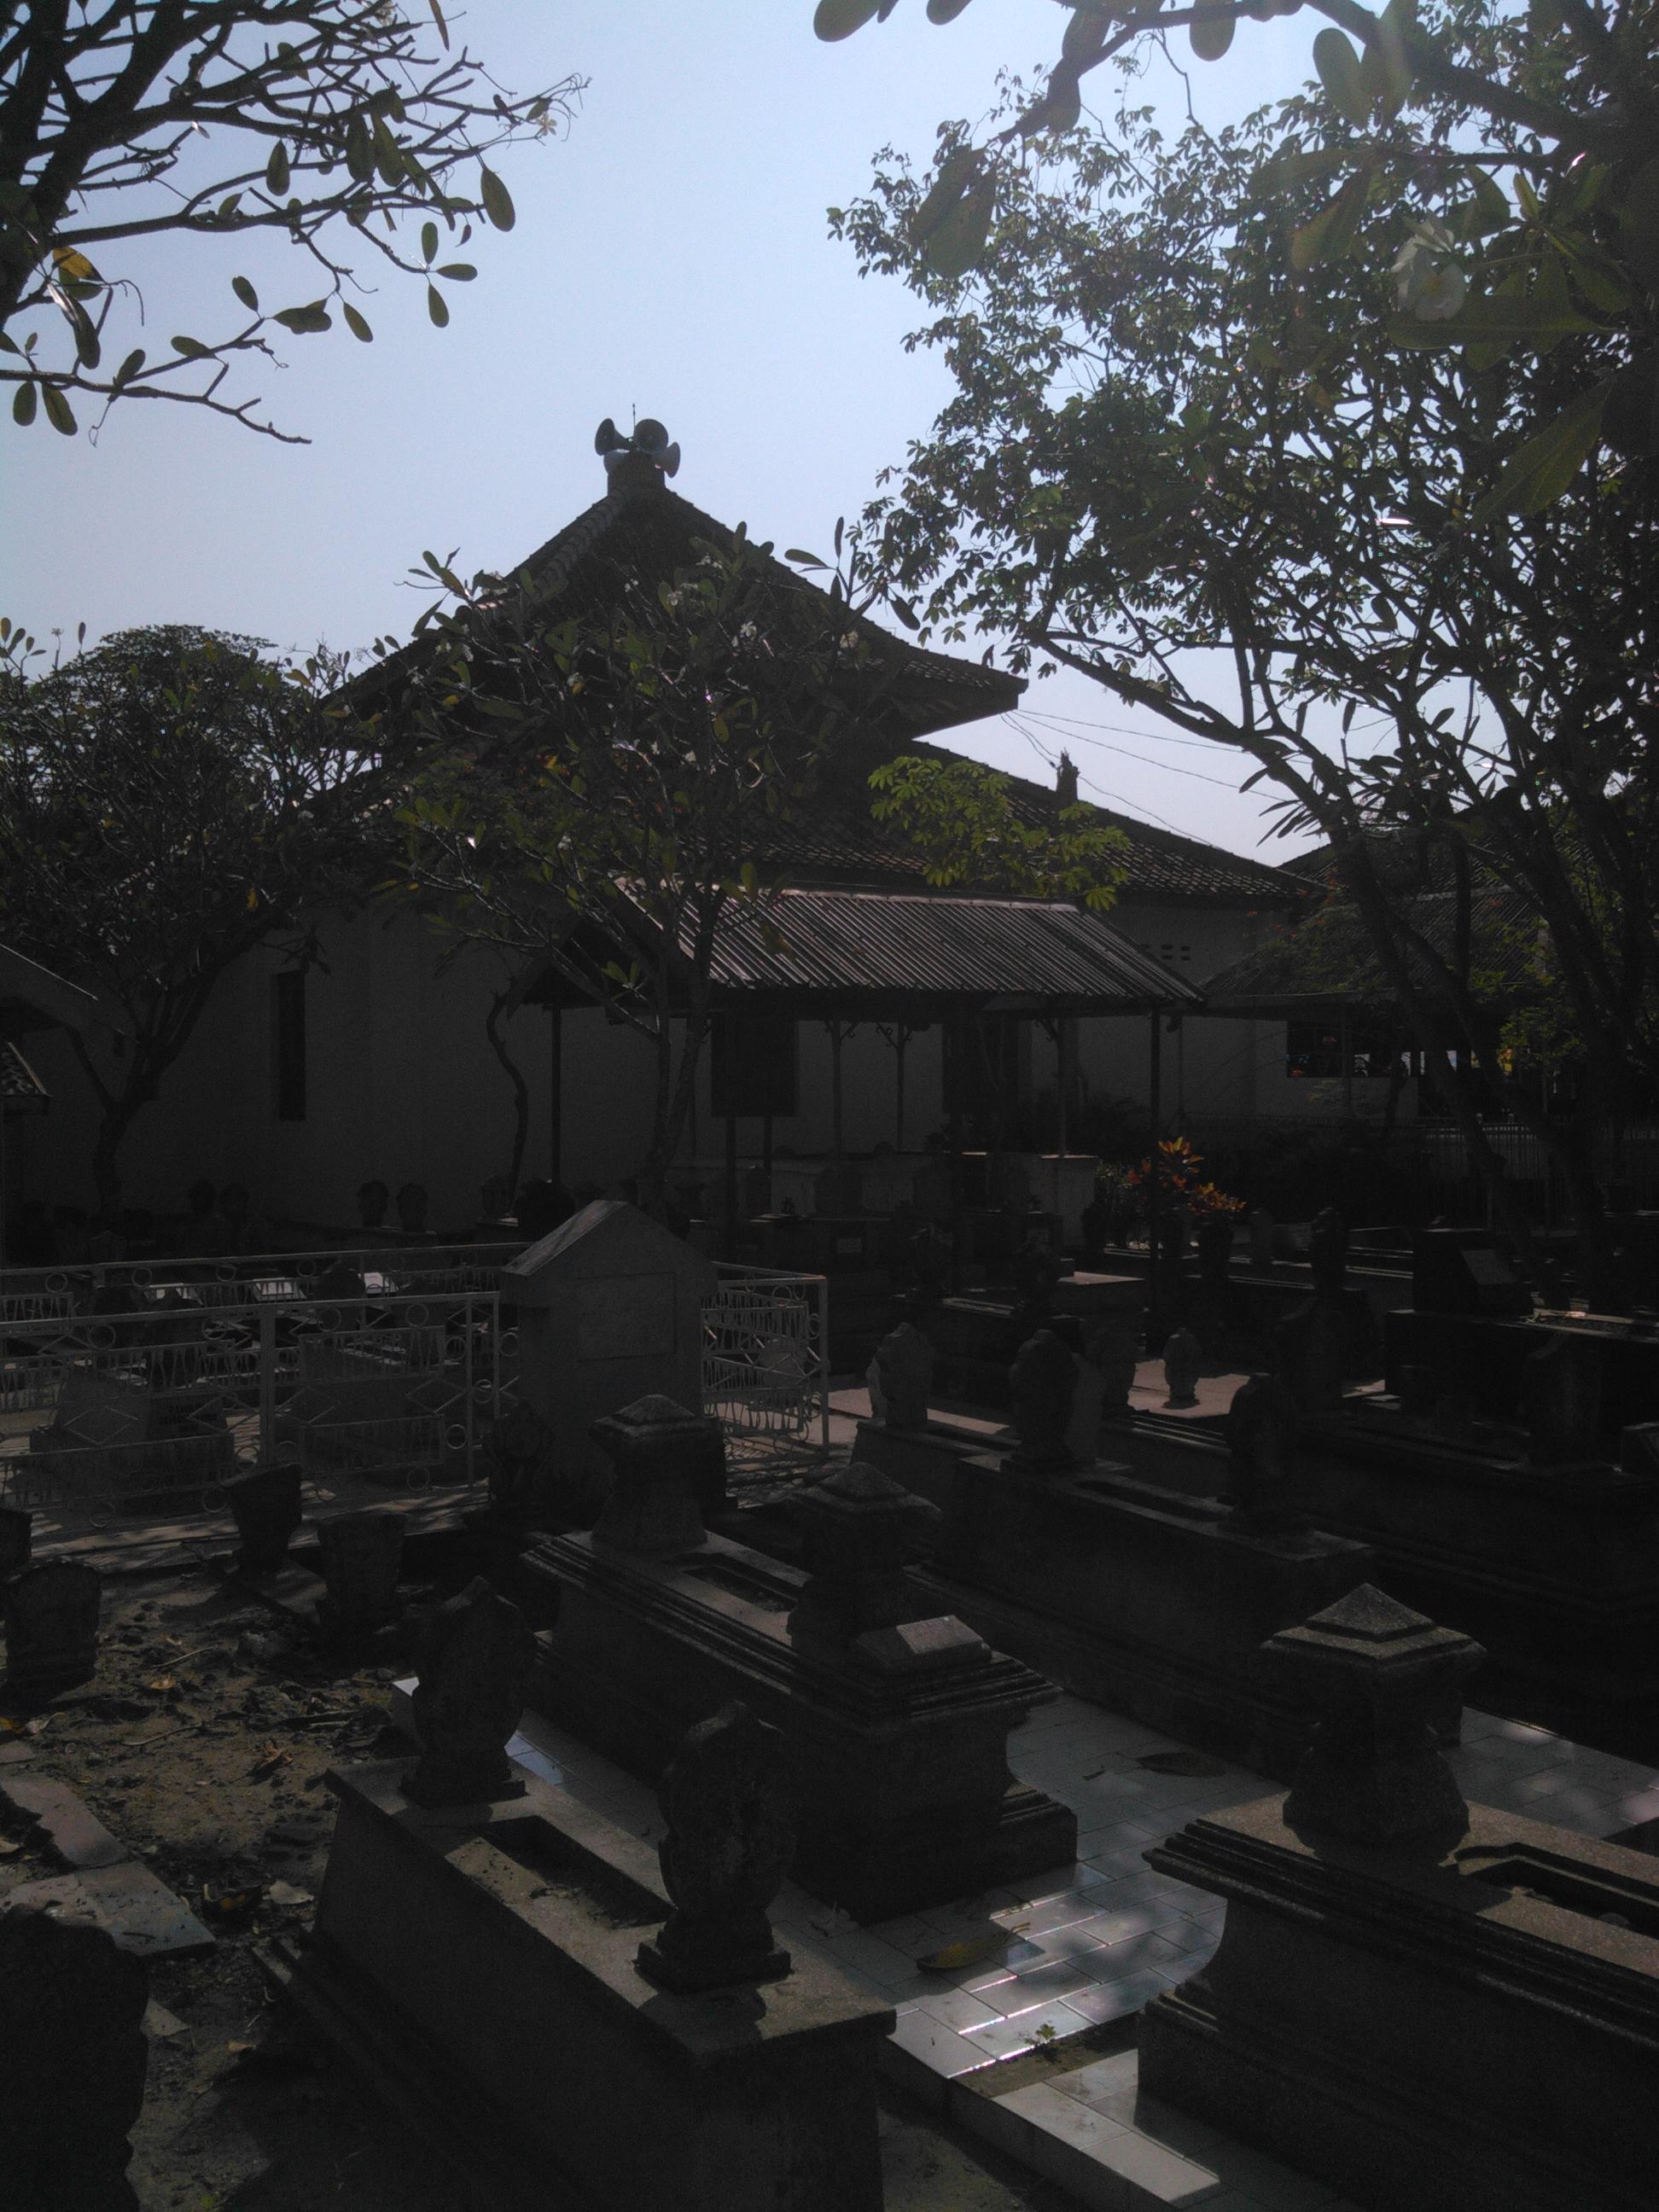 Masjid Kuno Kuncen Makam Kno Taman Kab Madiun